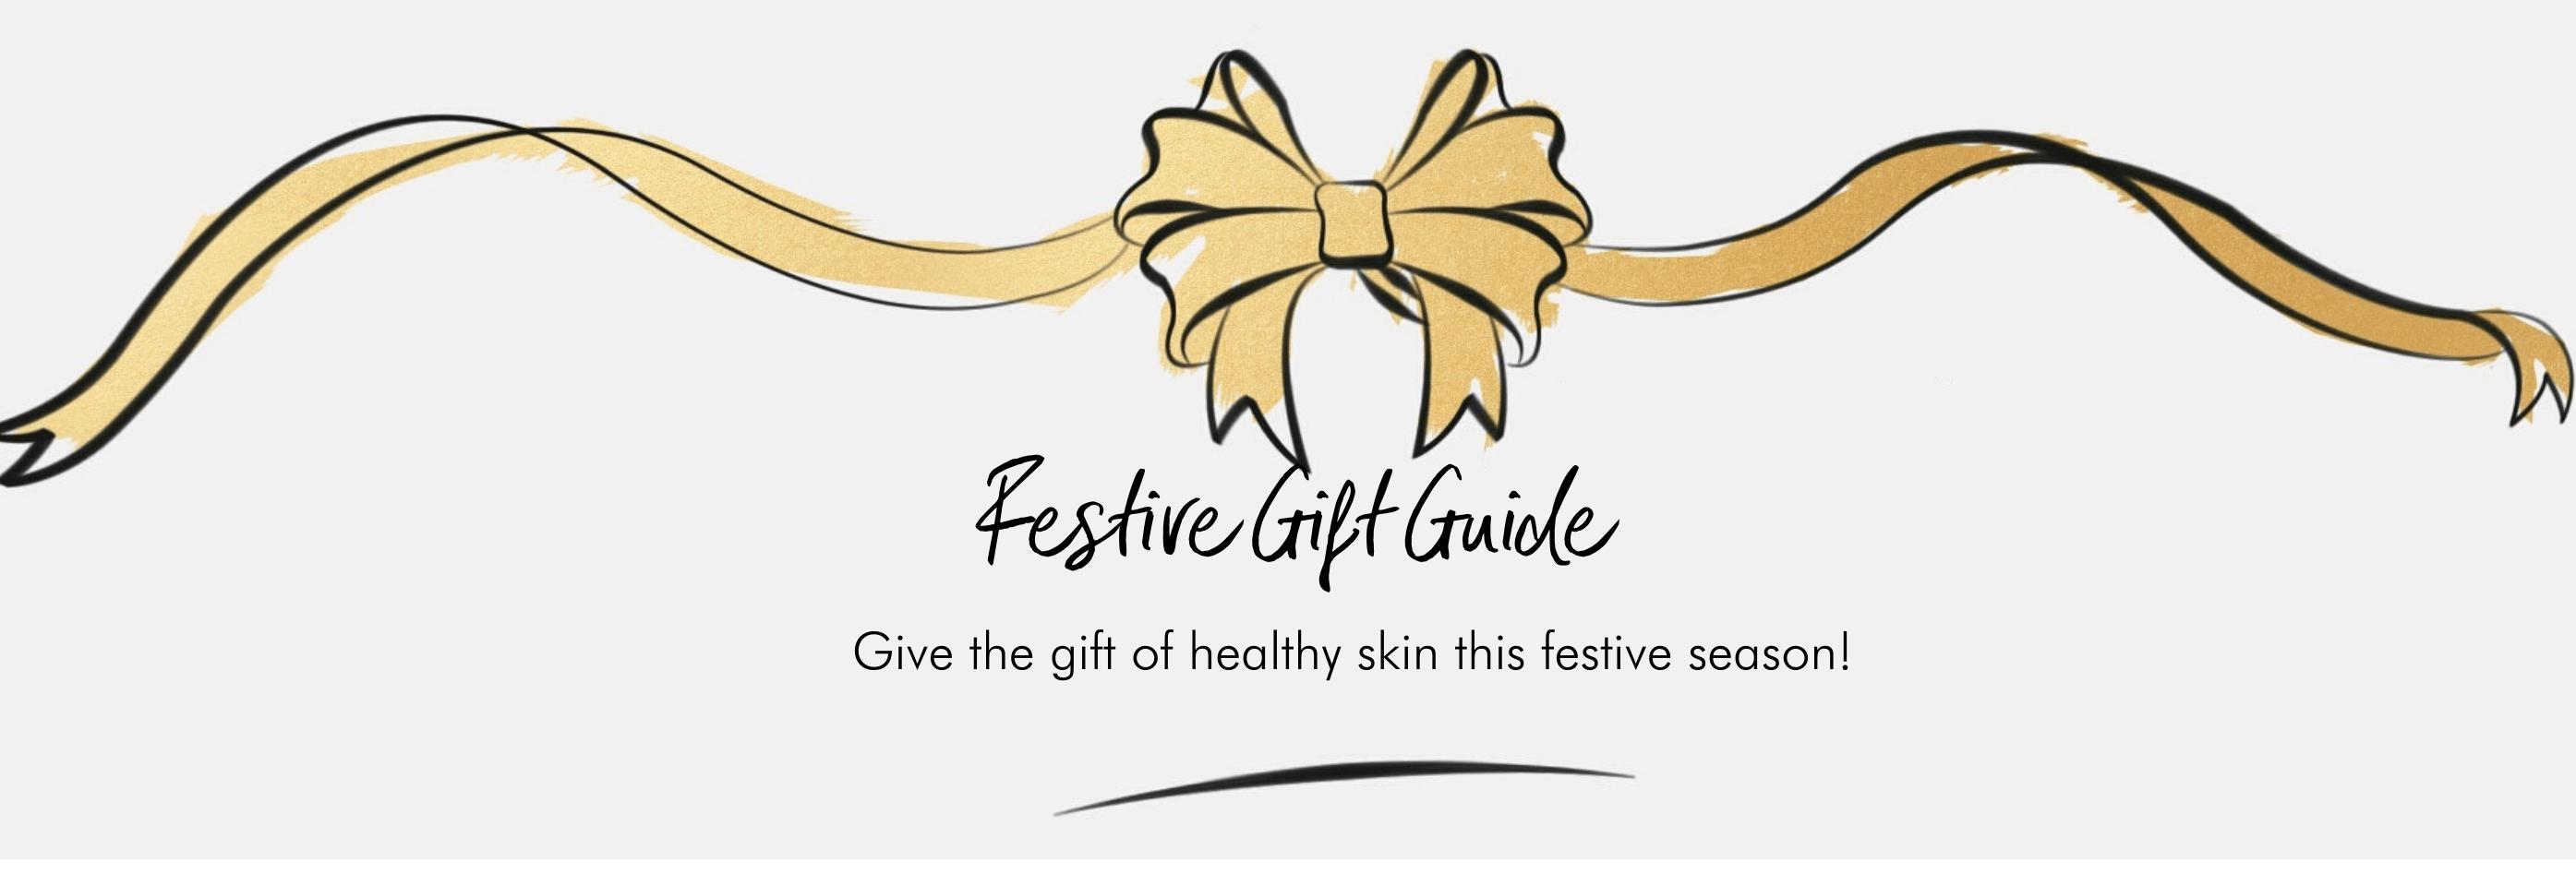 Neutrogena Festive Gift Guide